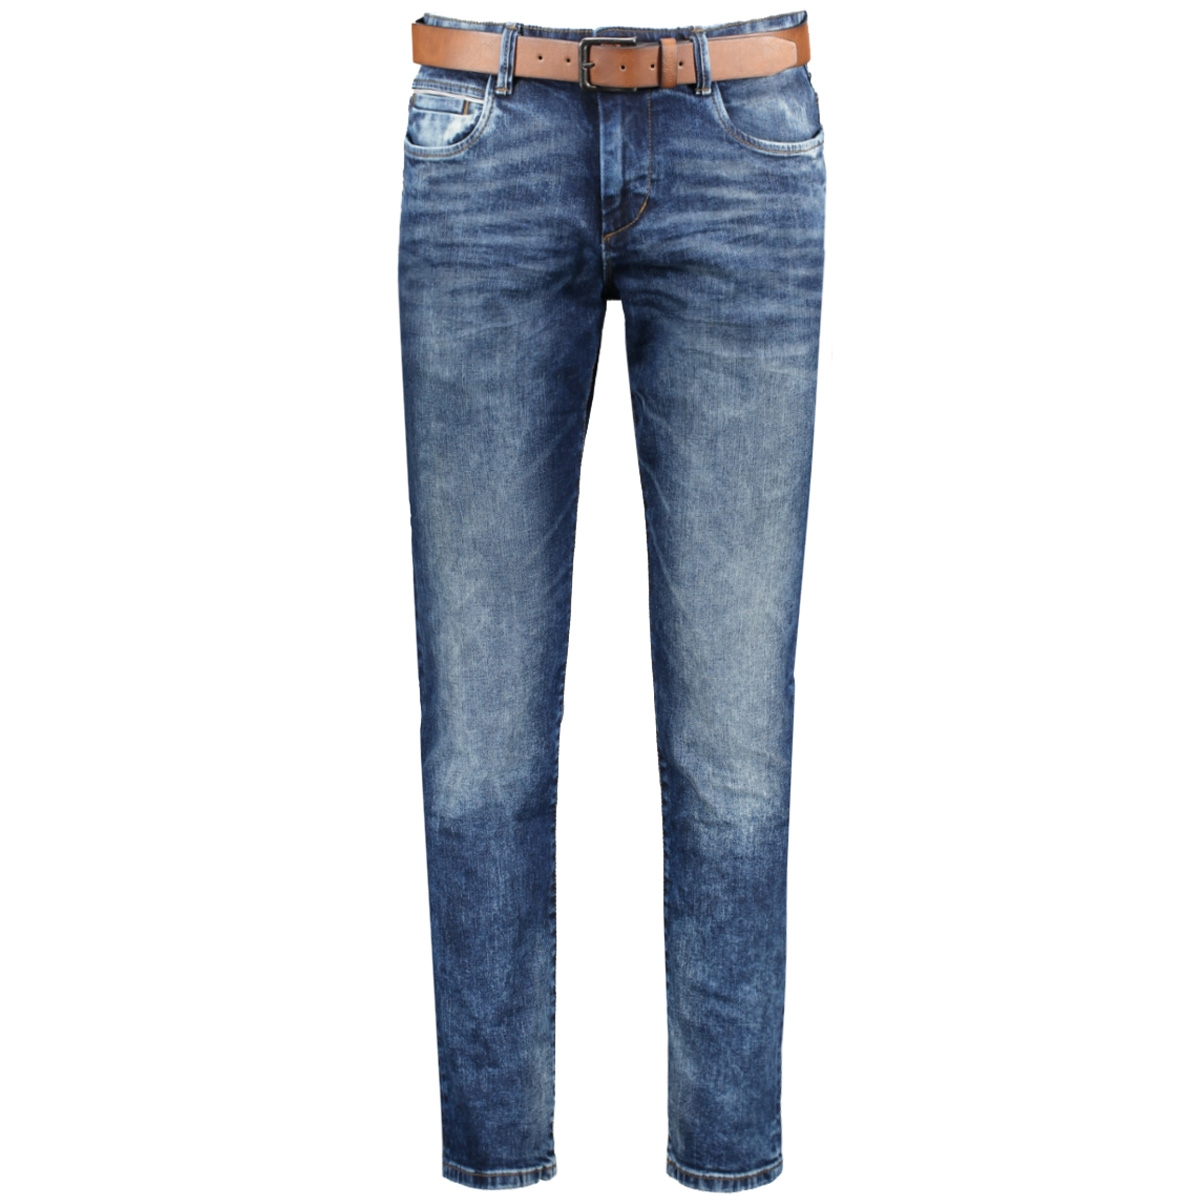 6205843.09.10 tom tailor jeans 1094